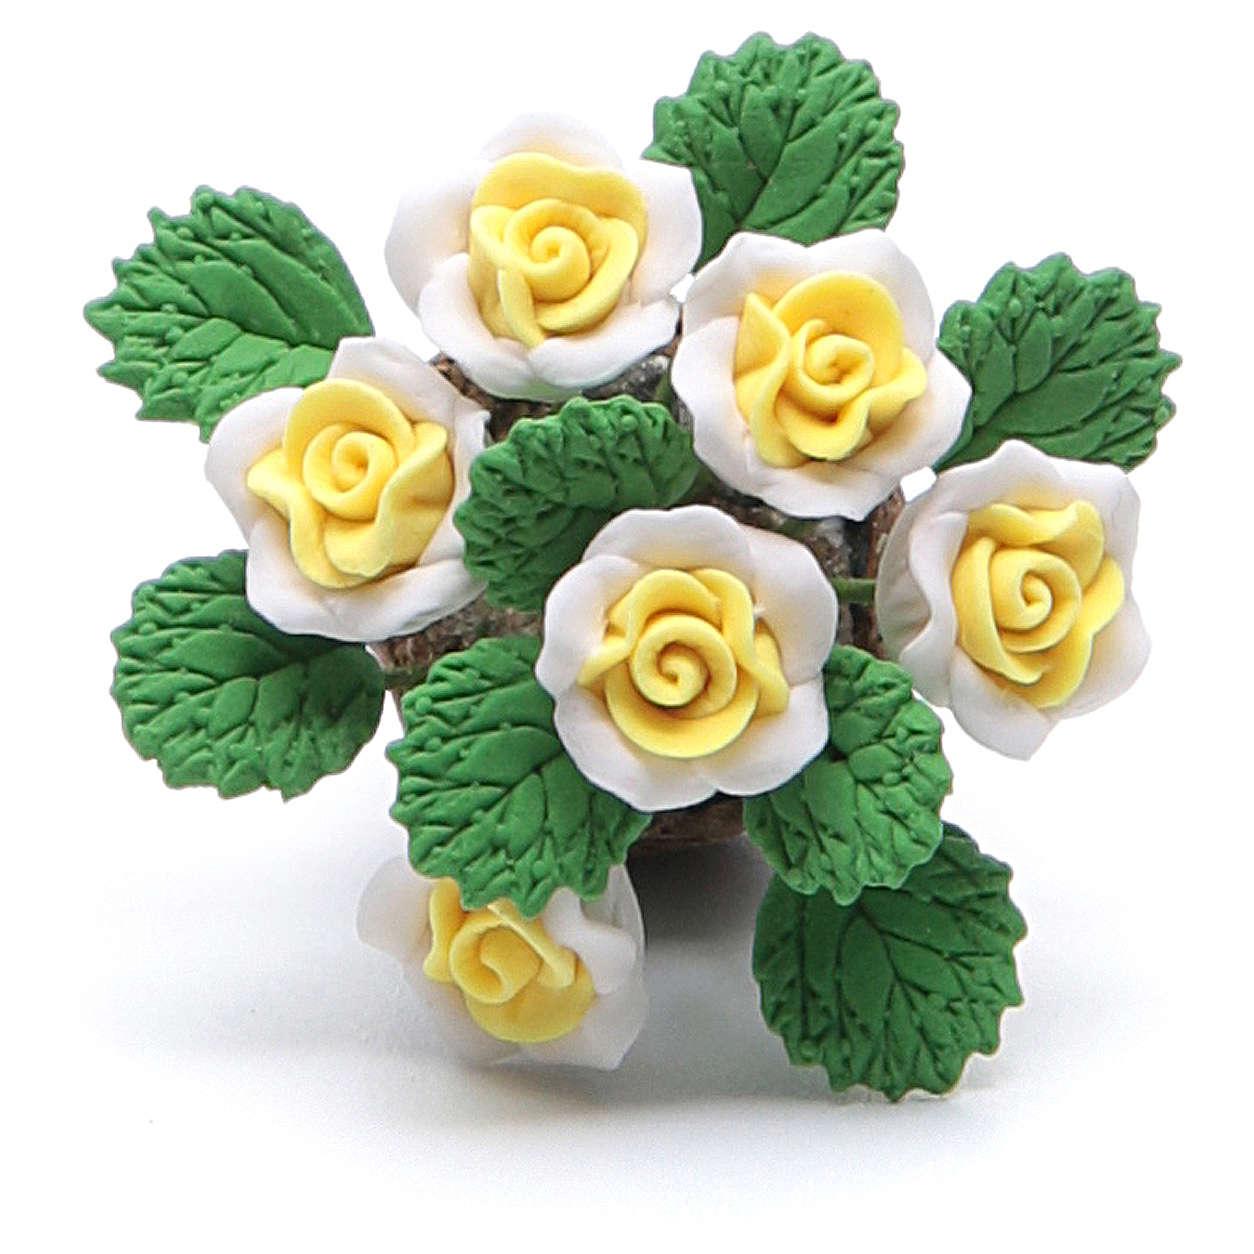 Flower pot, assorted nativity scene accessories 4